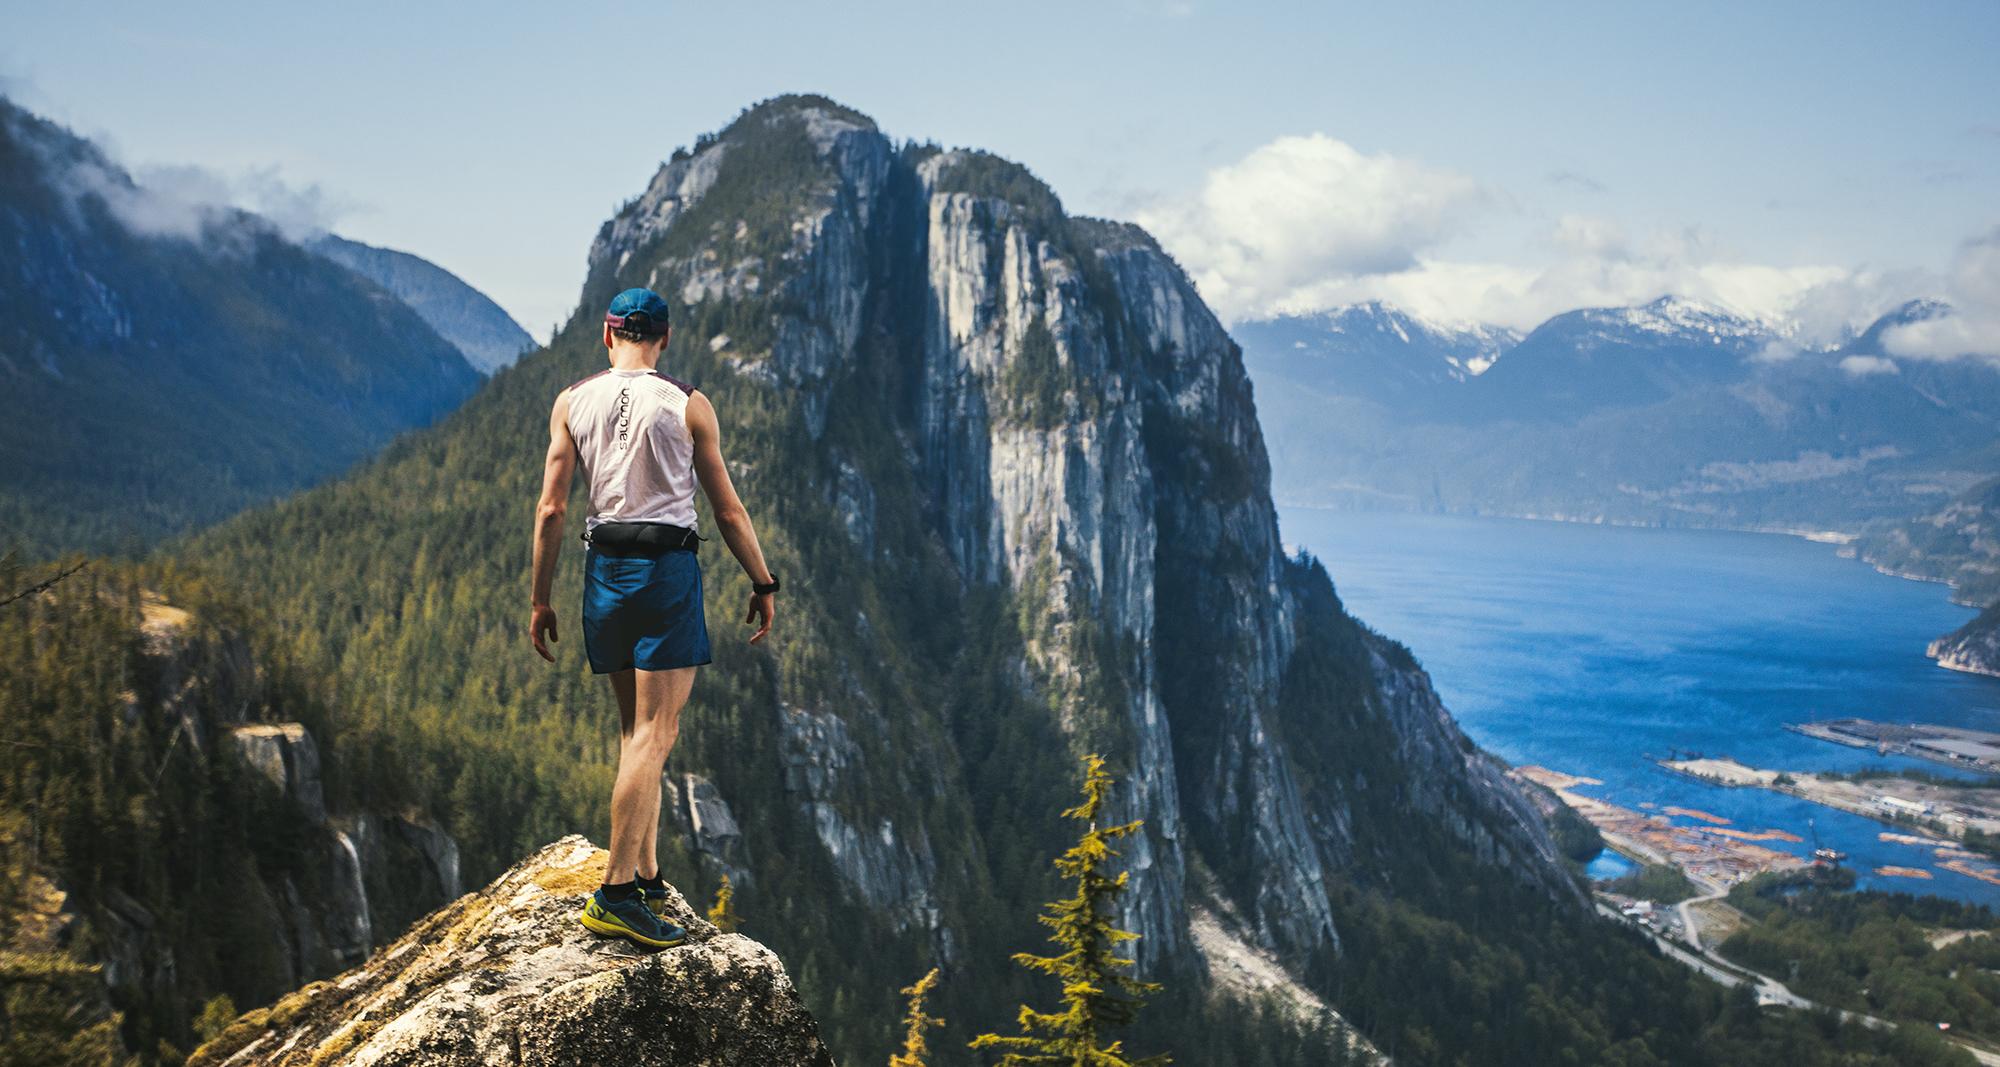 Brendan Urlocker - Salomon Athlete -IMG_3082 by Brice Ferre Studio - Vancouver Portrait Adventure and Athlete Photographer.jpg